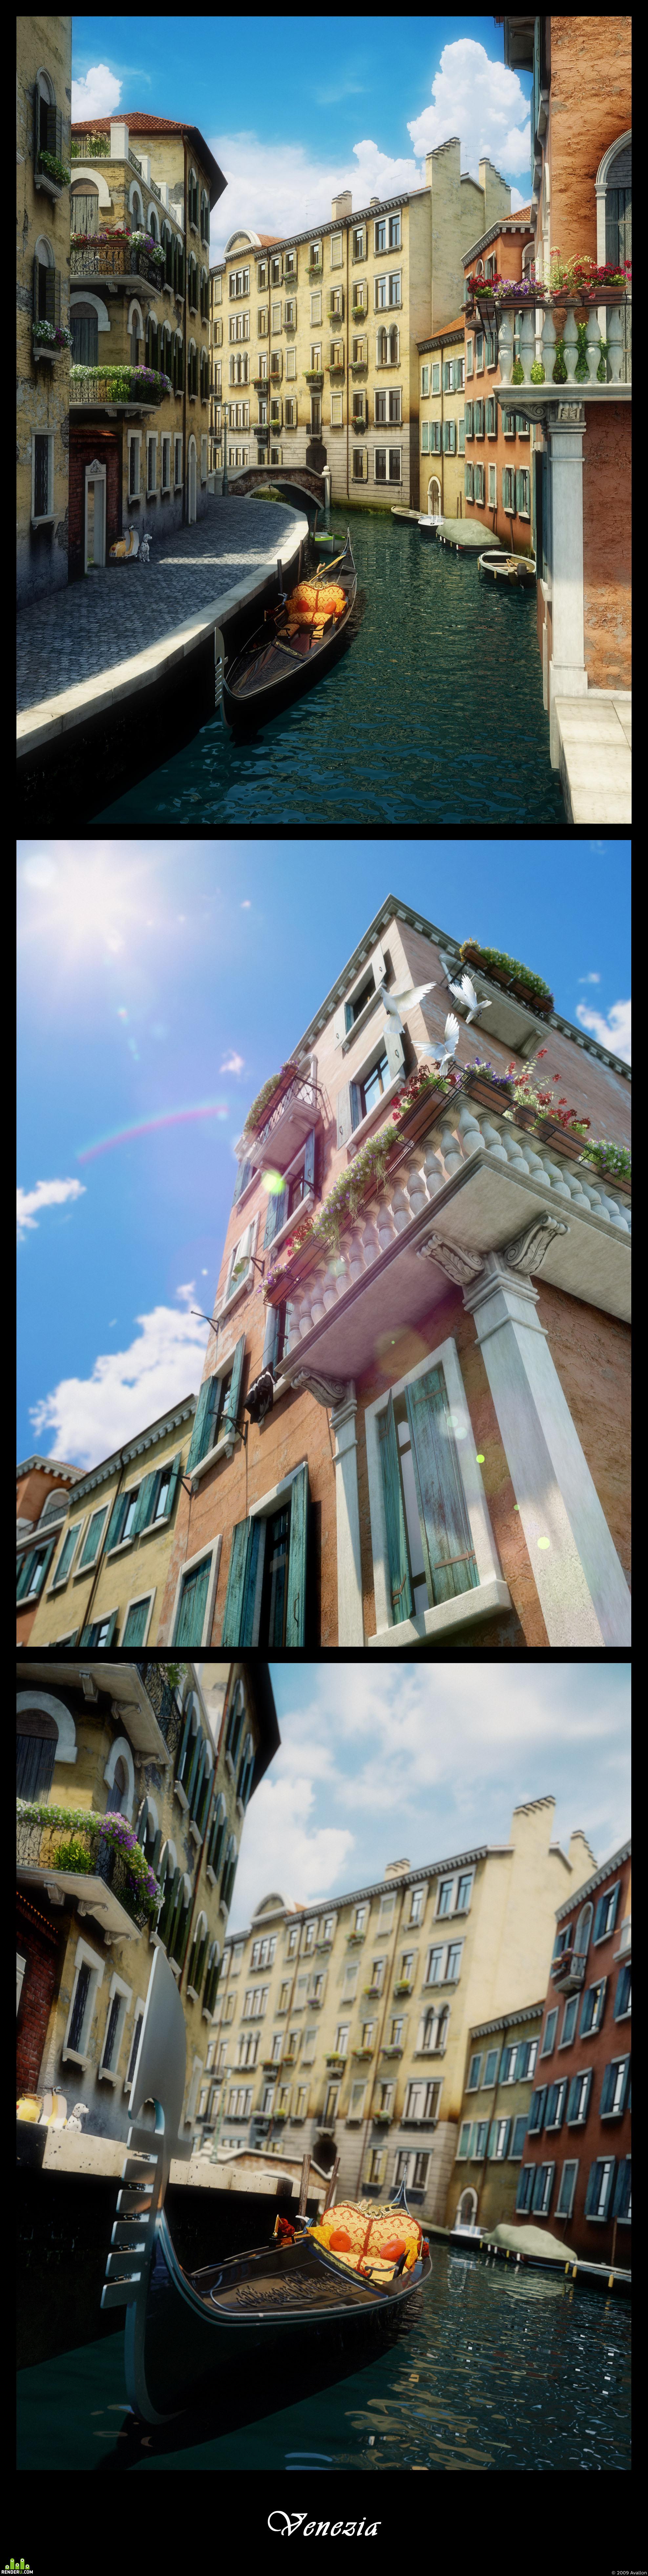 preview Venezia